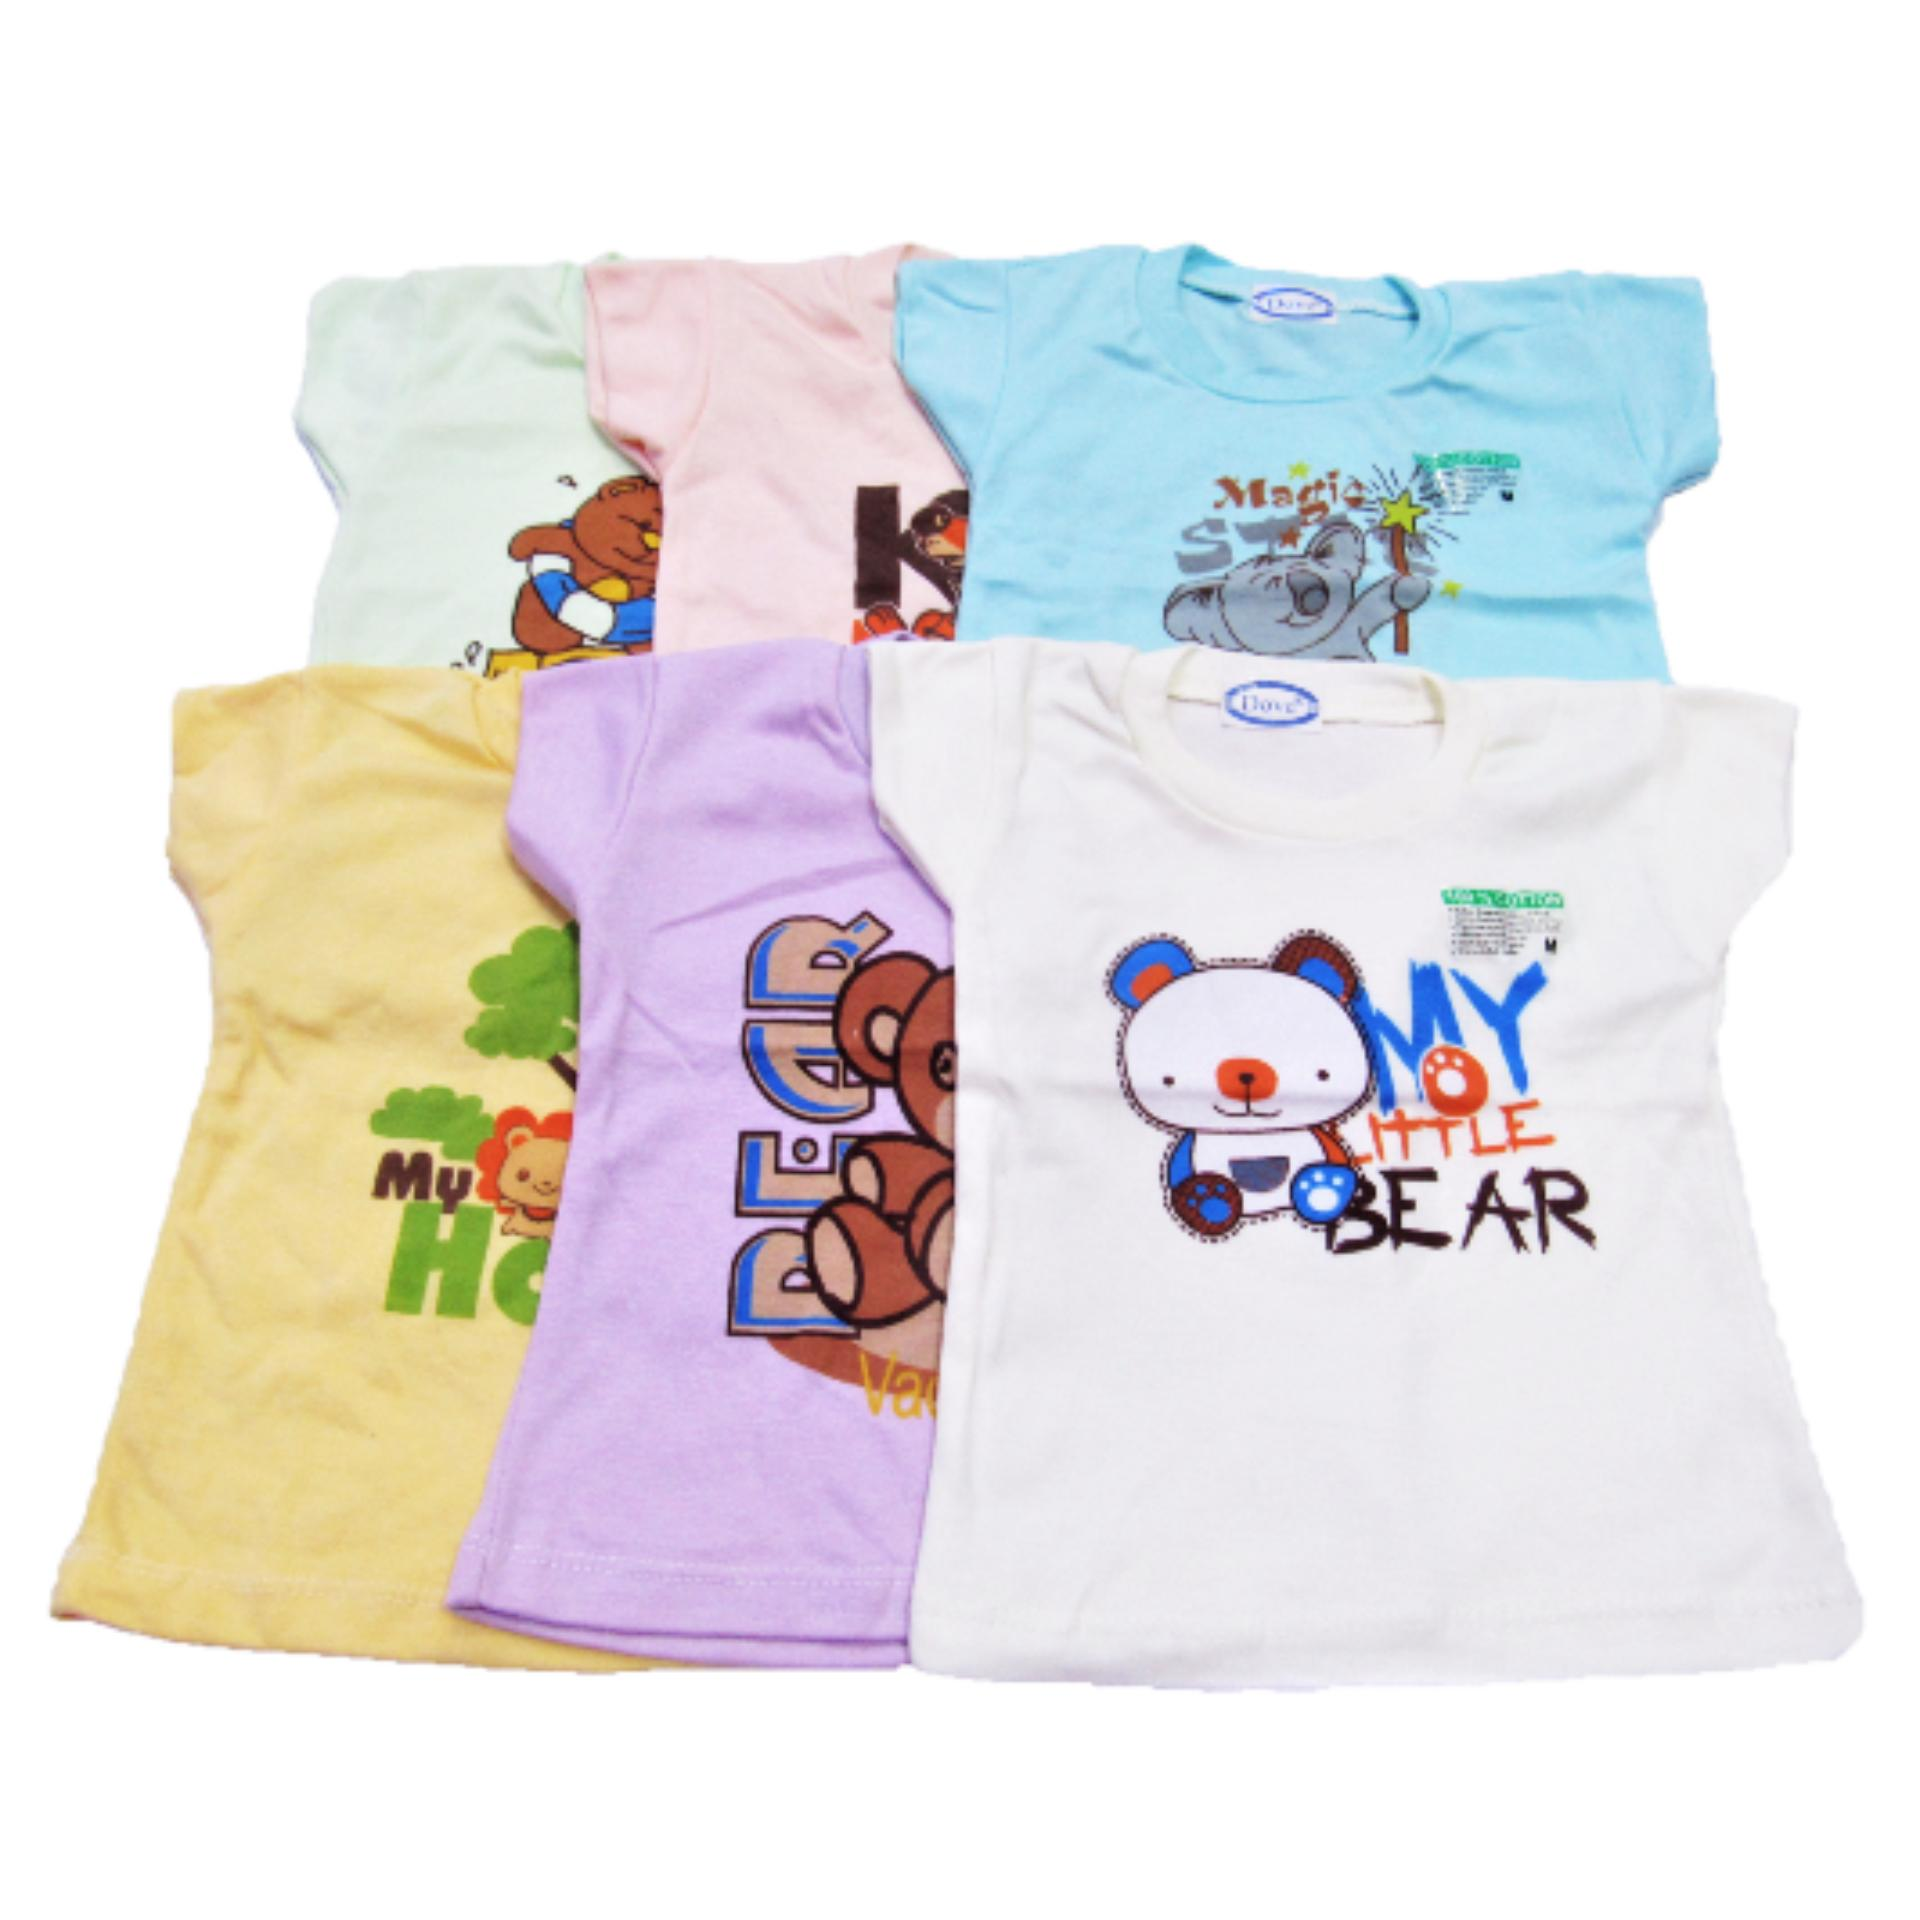 Wulanda 6 pcs baju kaos oblong anak bayi warna dan motif yang berbeda